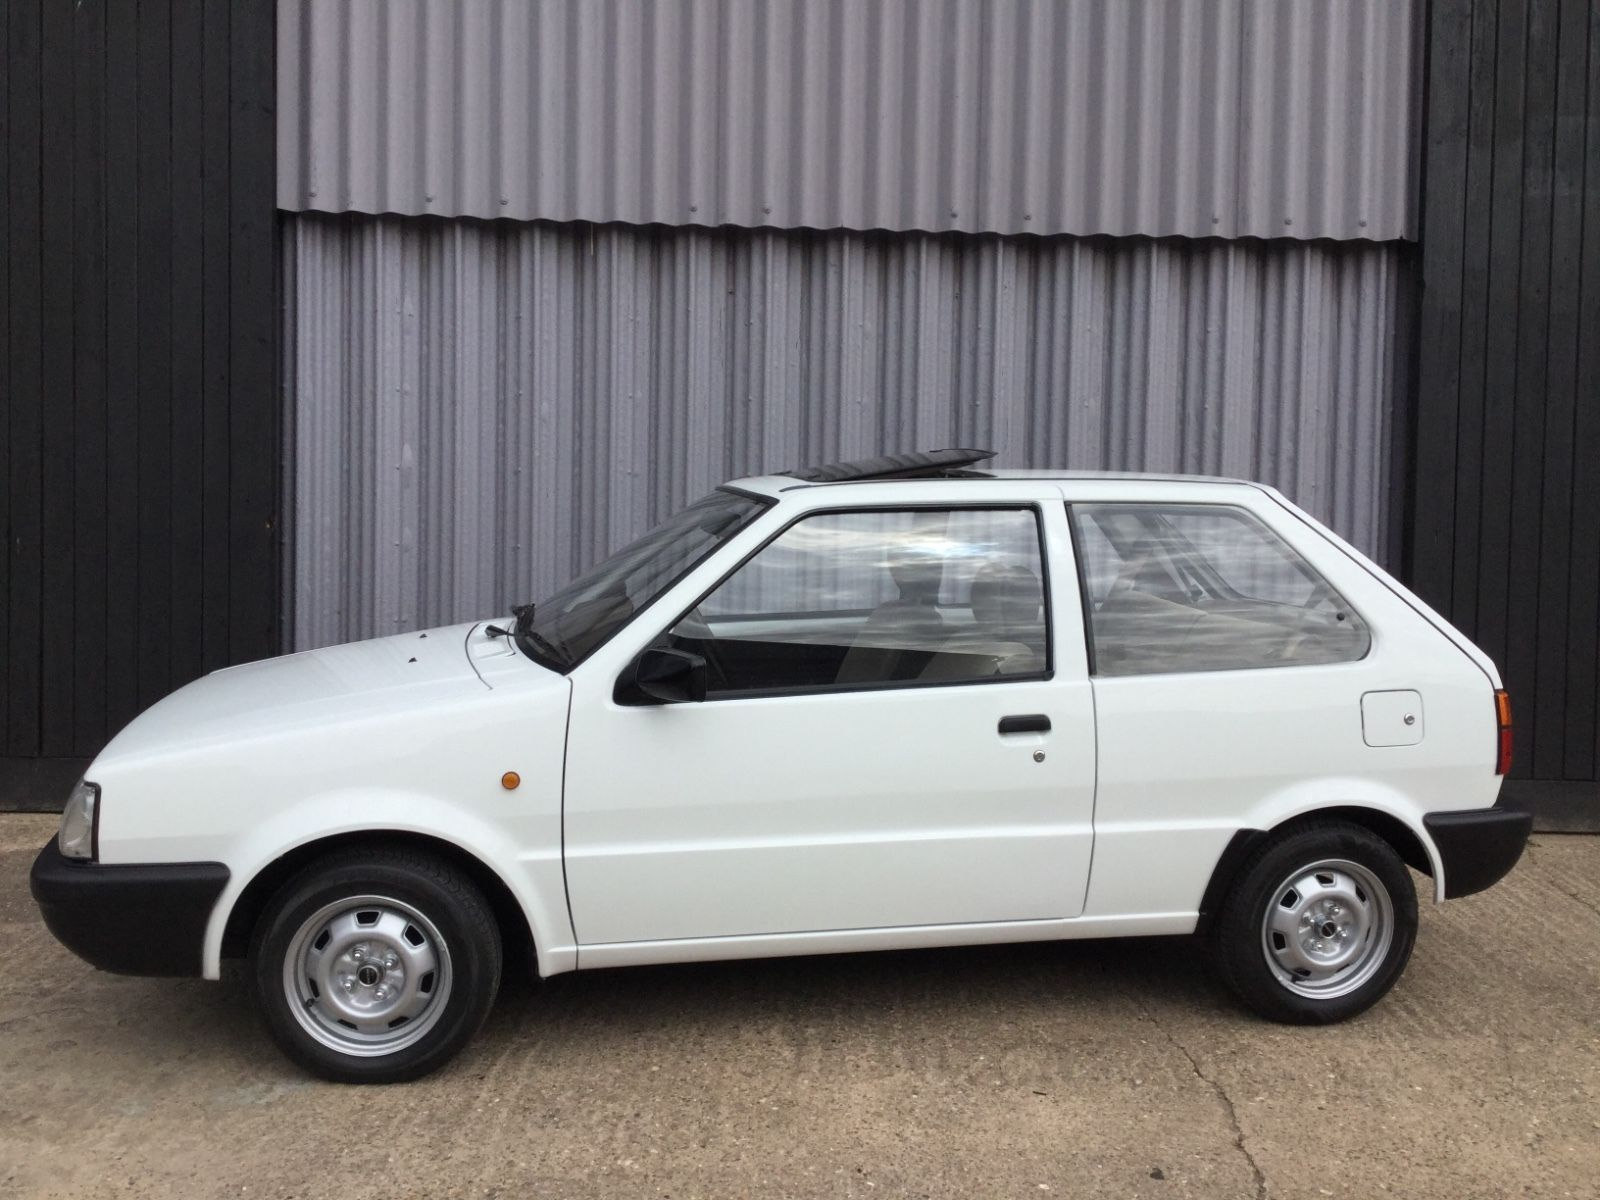 Ebay  Nissan Micra K10 1 0 Ls 28 000miles  Timewarp